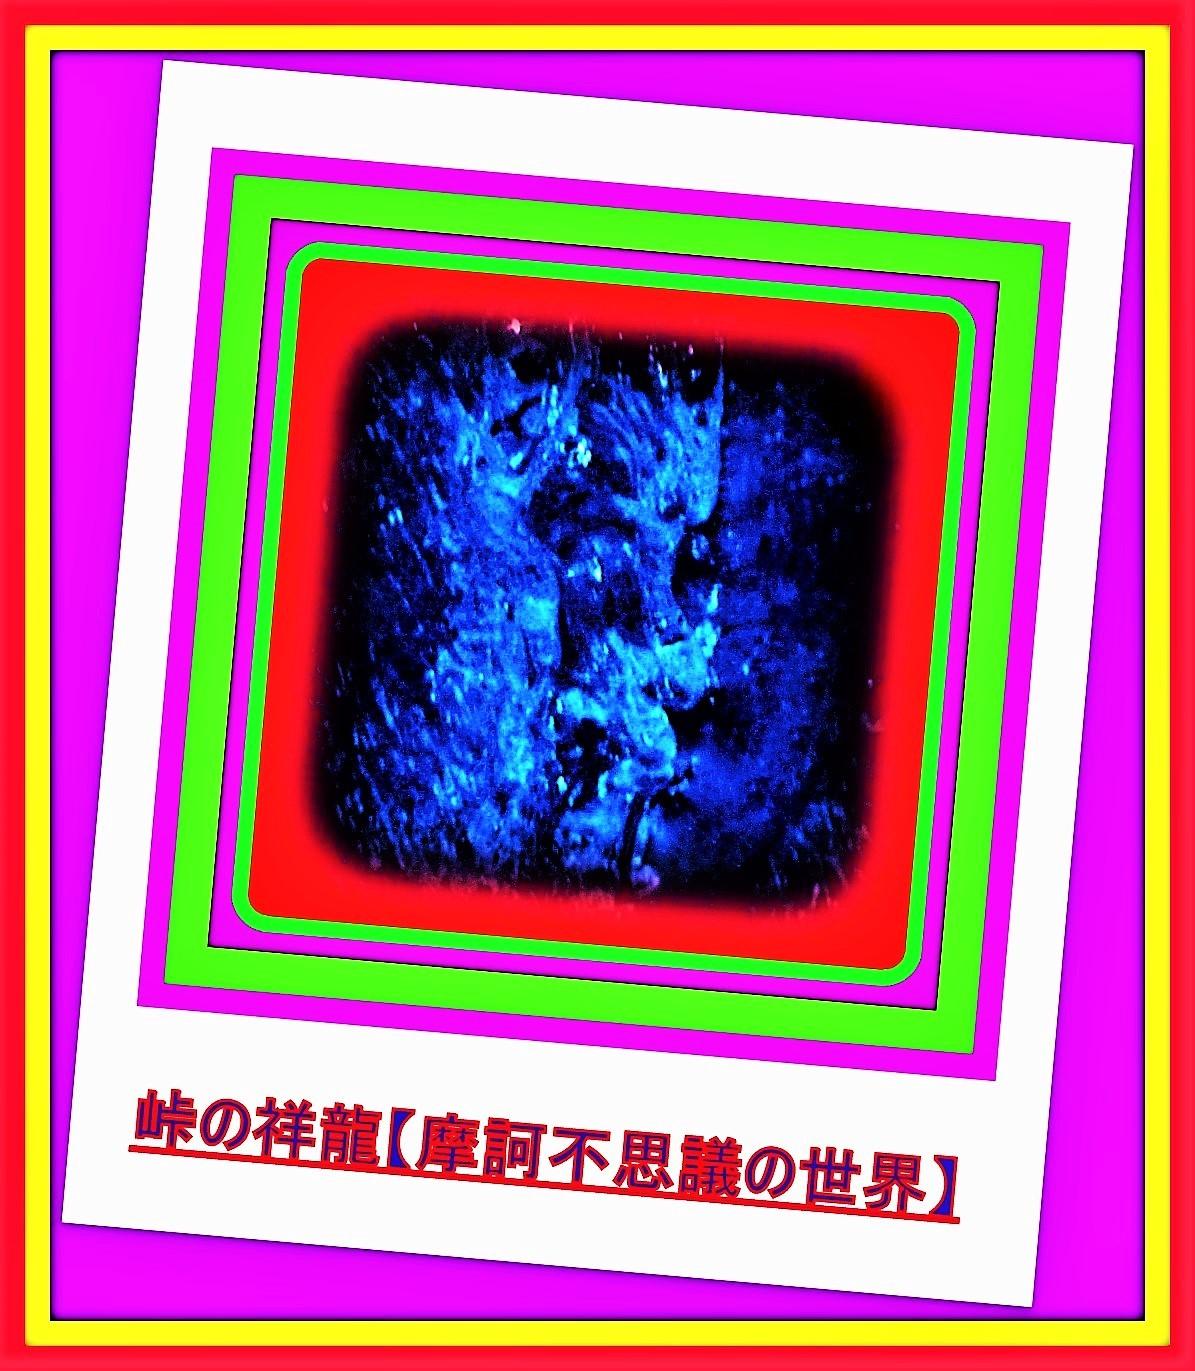 201911072021250e6.jpg